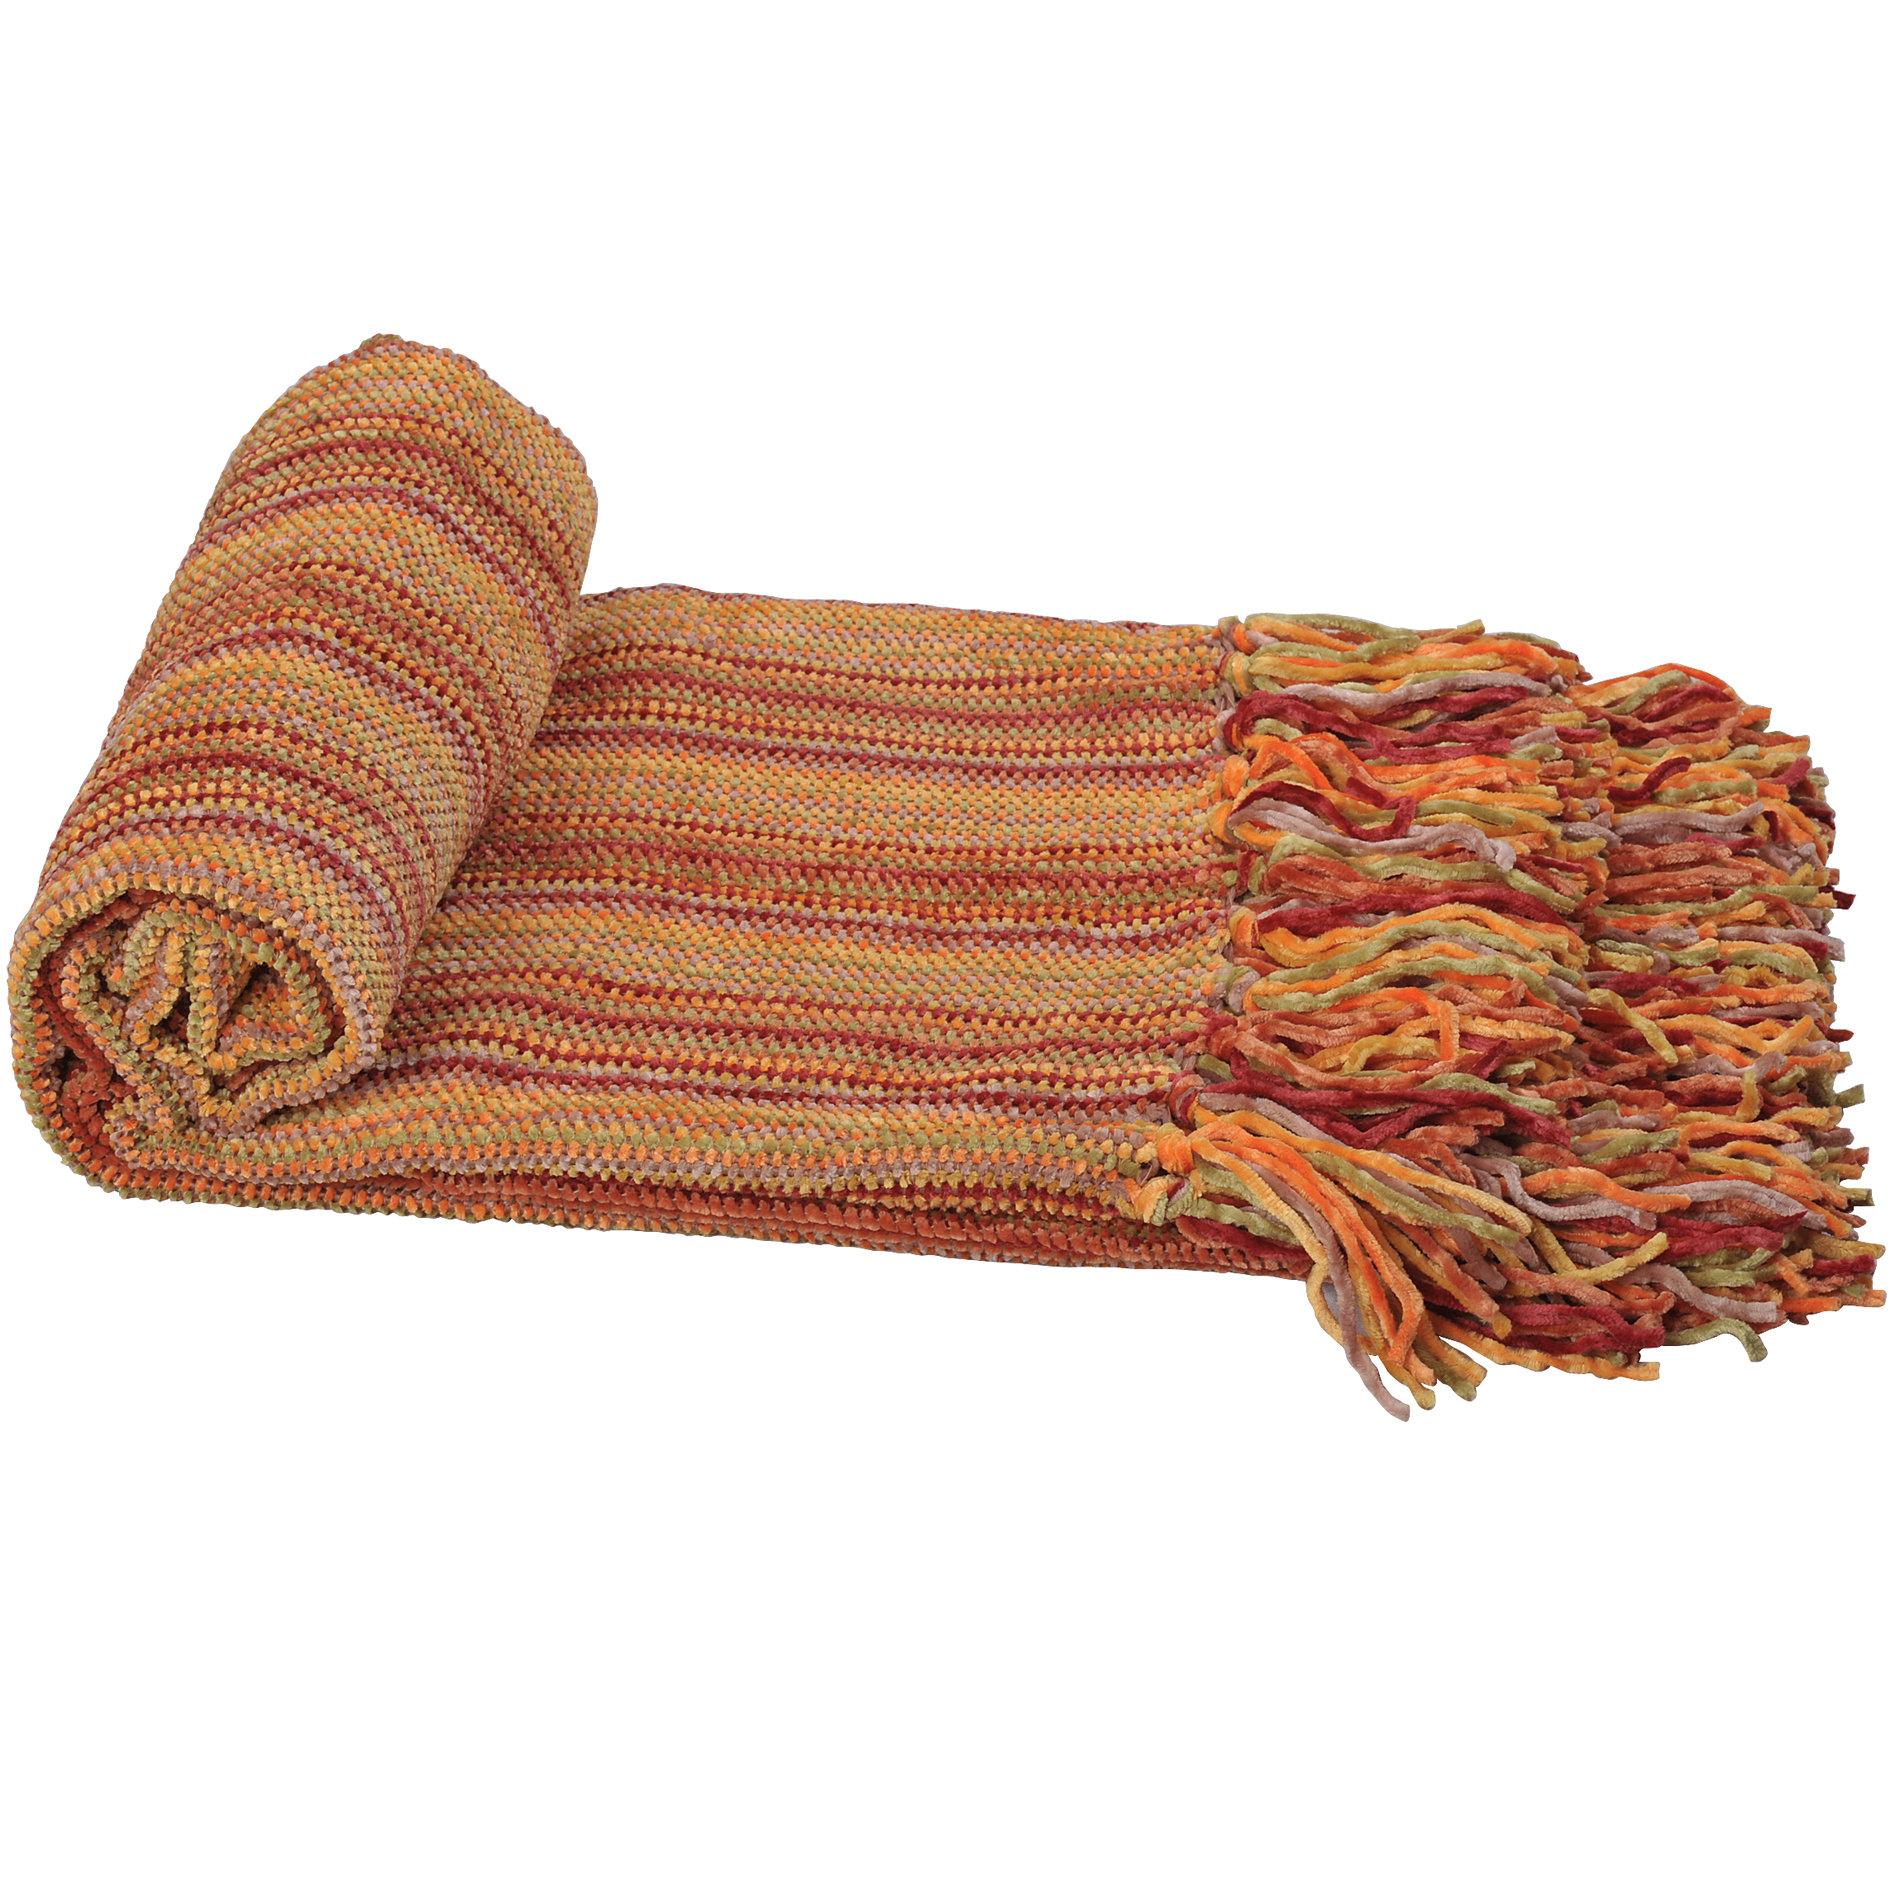 BOON Throw   Blanket Crystal Chenille Blanket  9f310c3d8